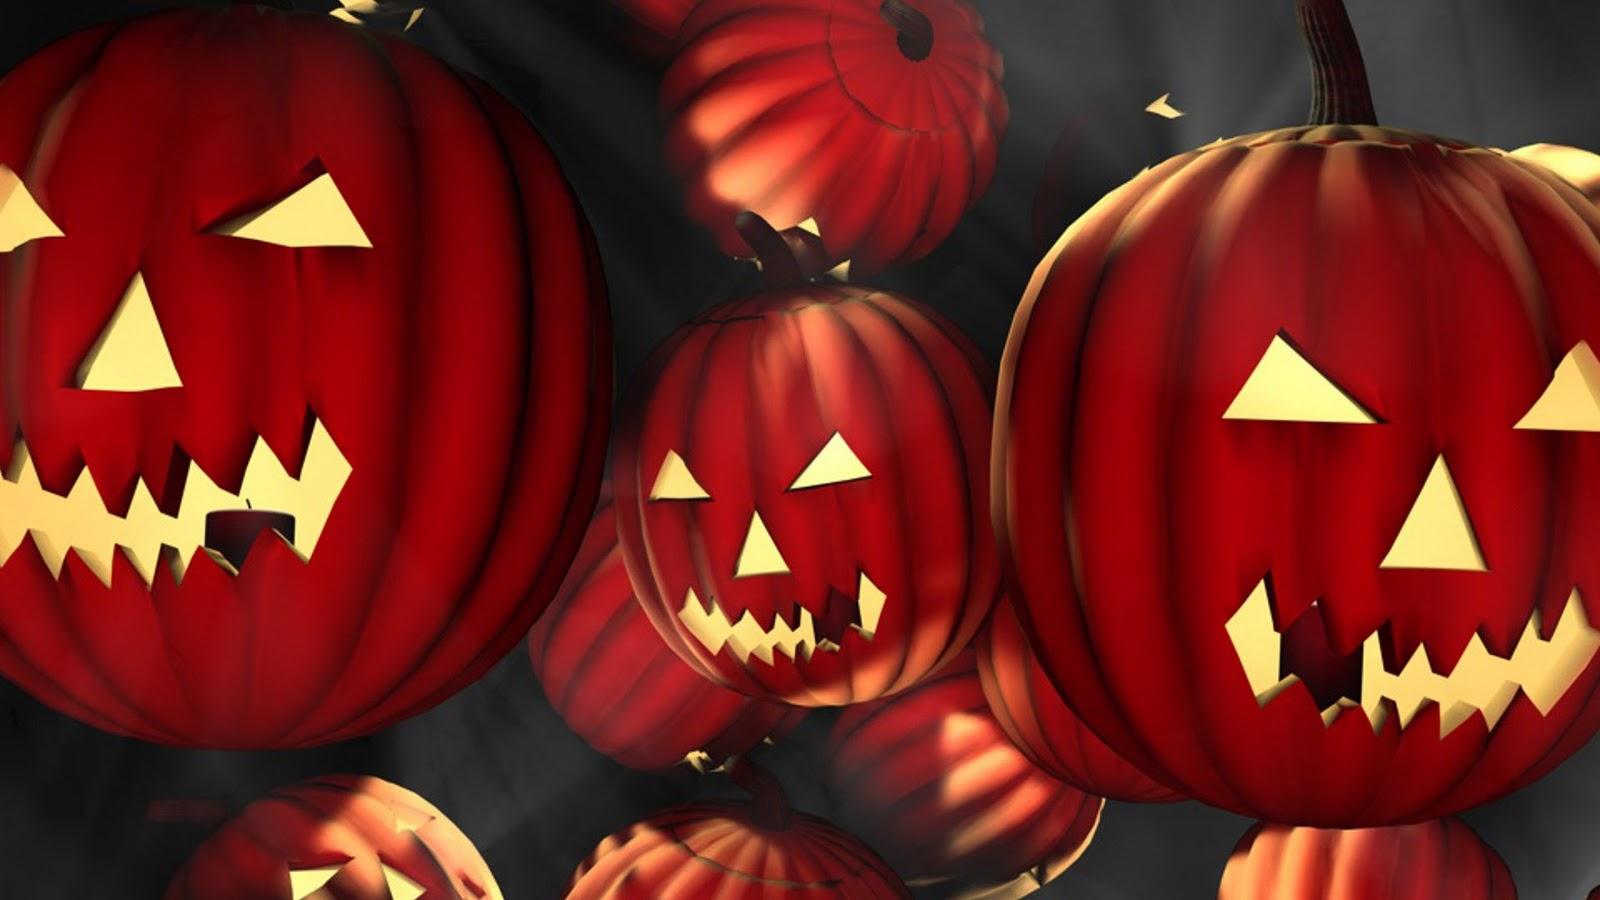 Home Design 3d Pc Game Best Desktop Hd Wallpaper Halloween Wallpapers